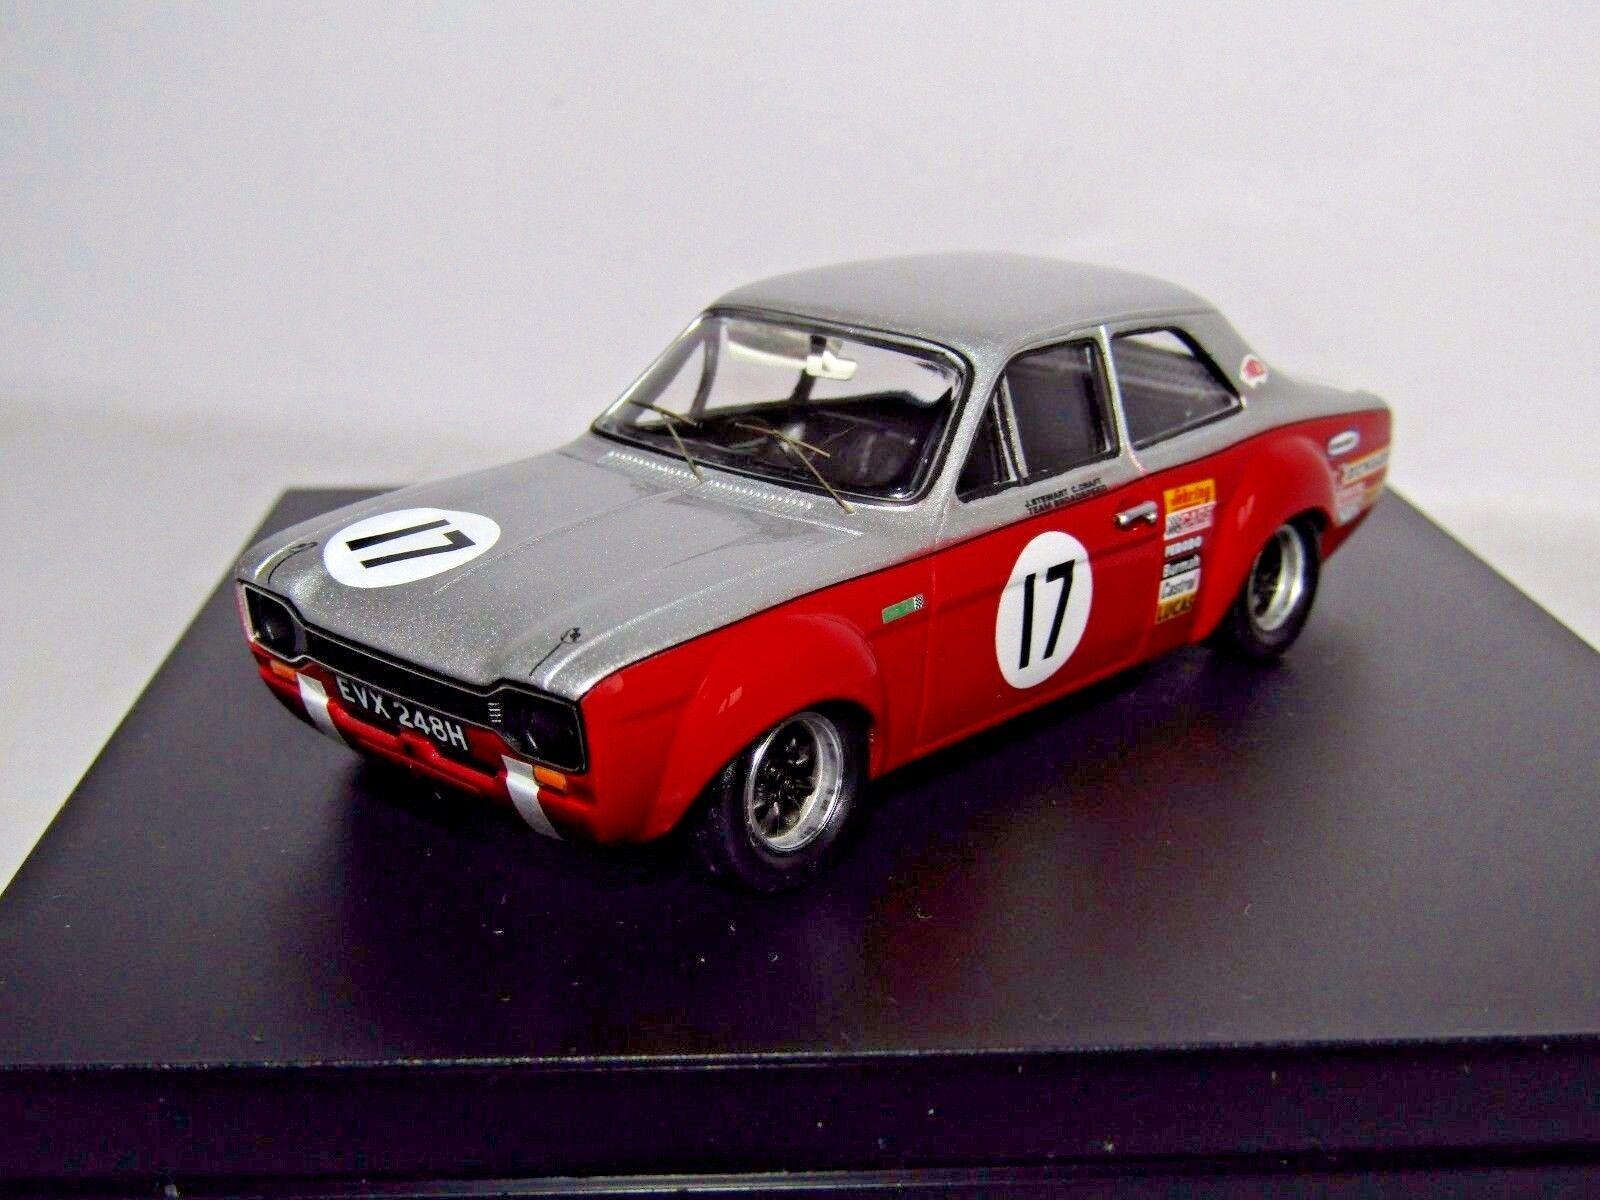 100% garantía genuina de contador Trofeu 527 Ford Escort Mk I 1600 Tc platastone 1970 1970 1970 J Stewart 1 43  tienda de venta